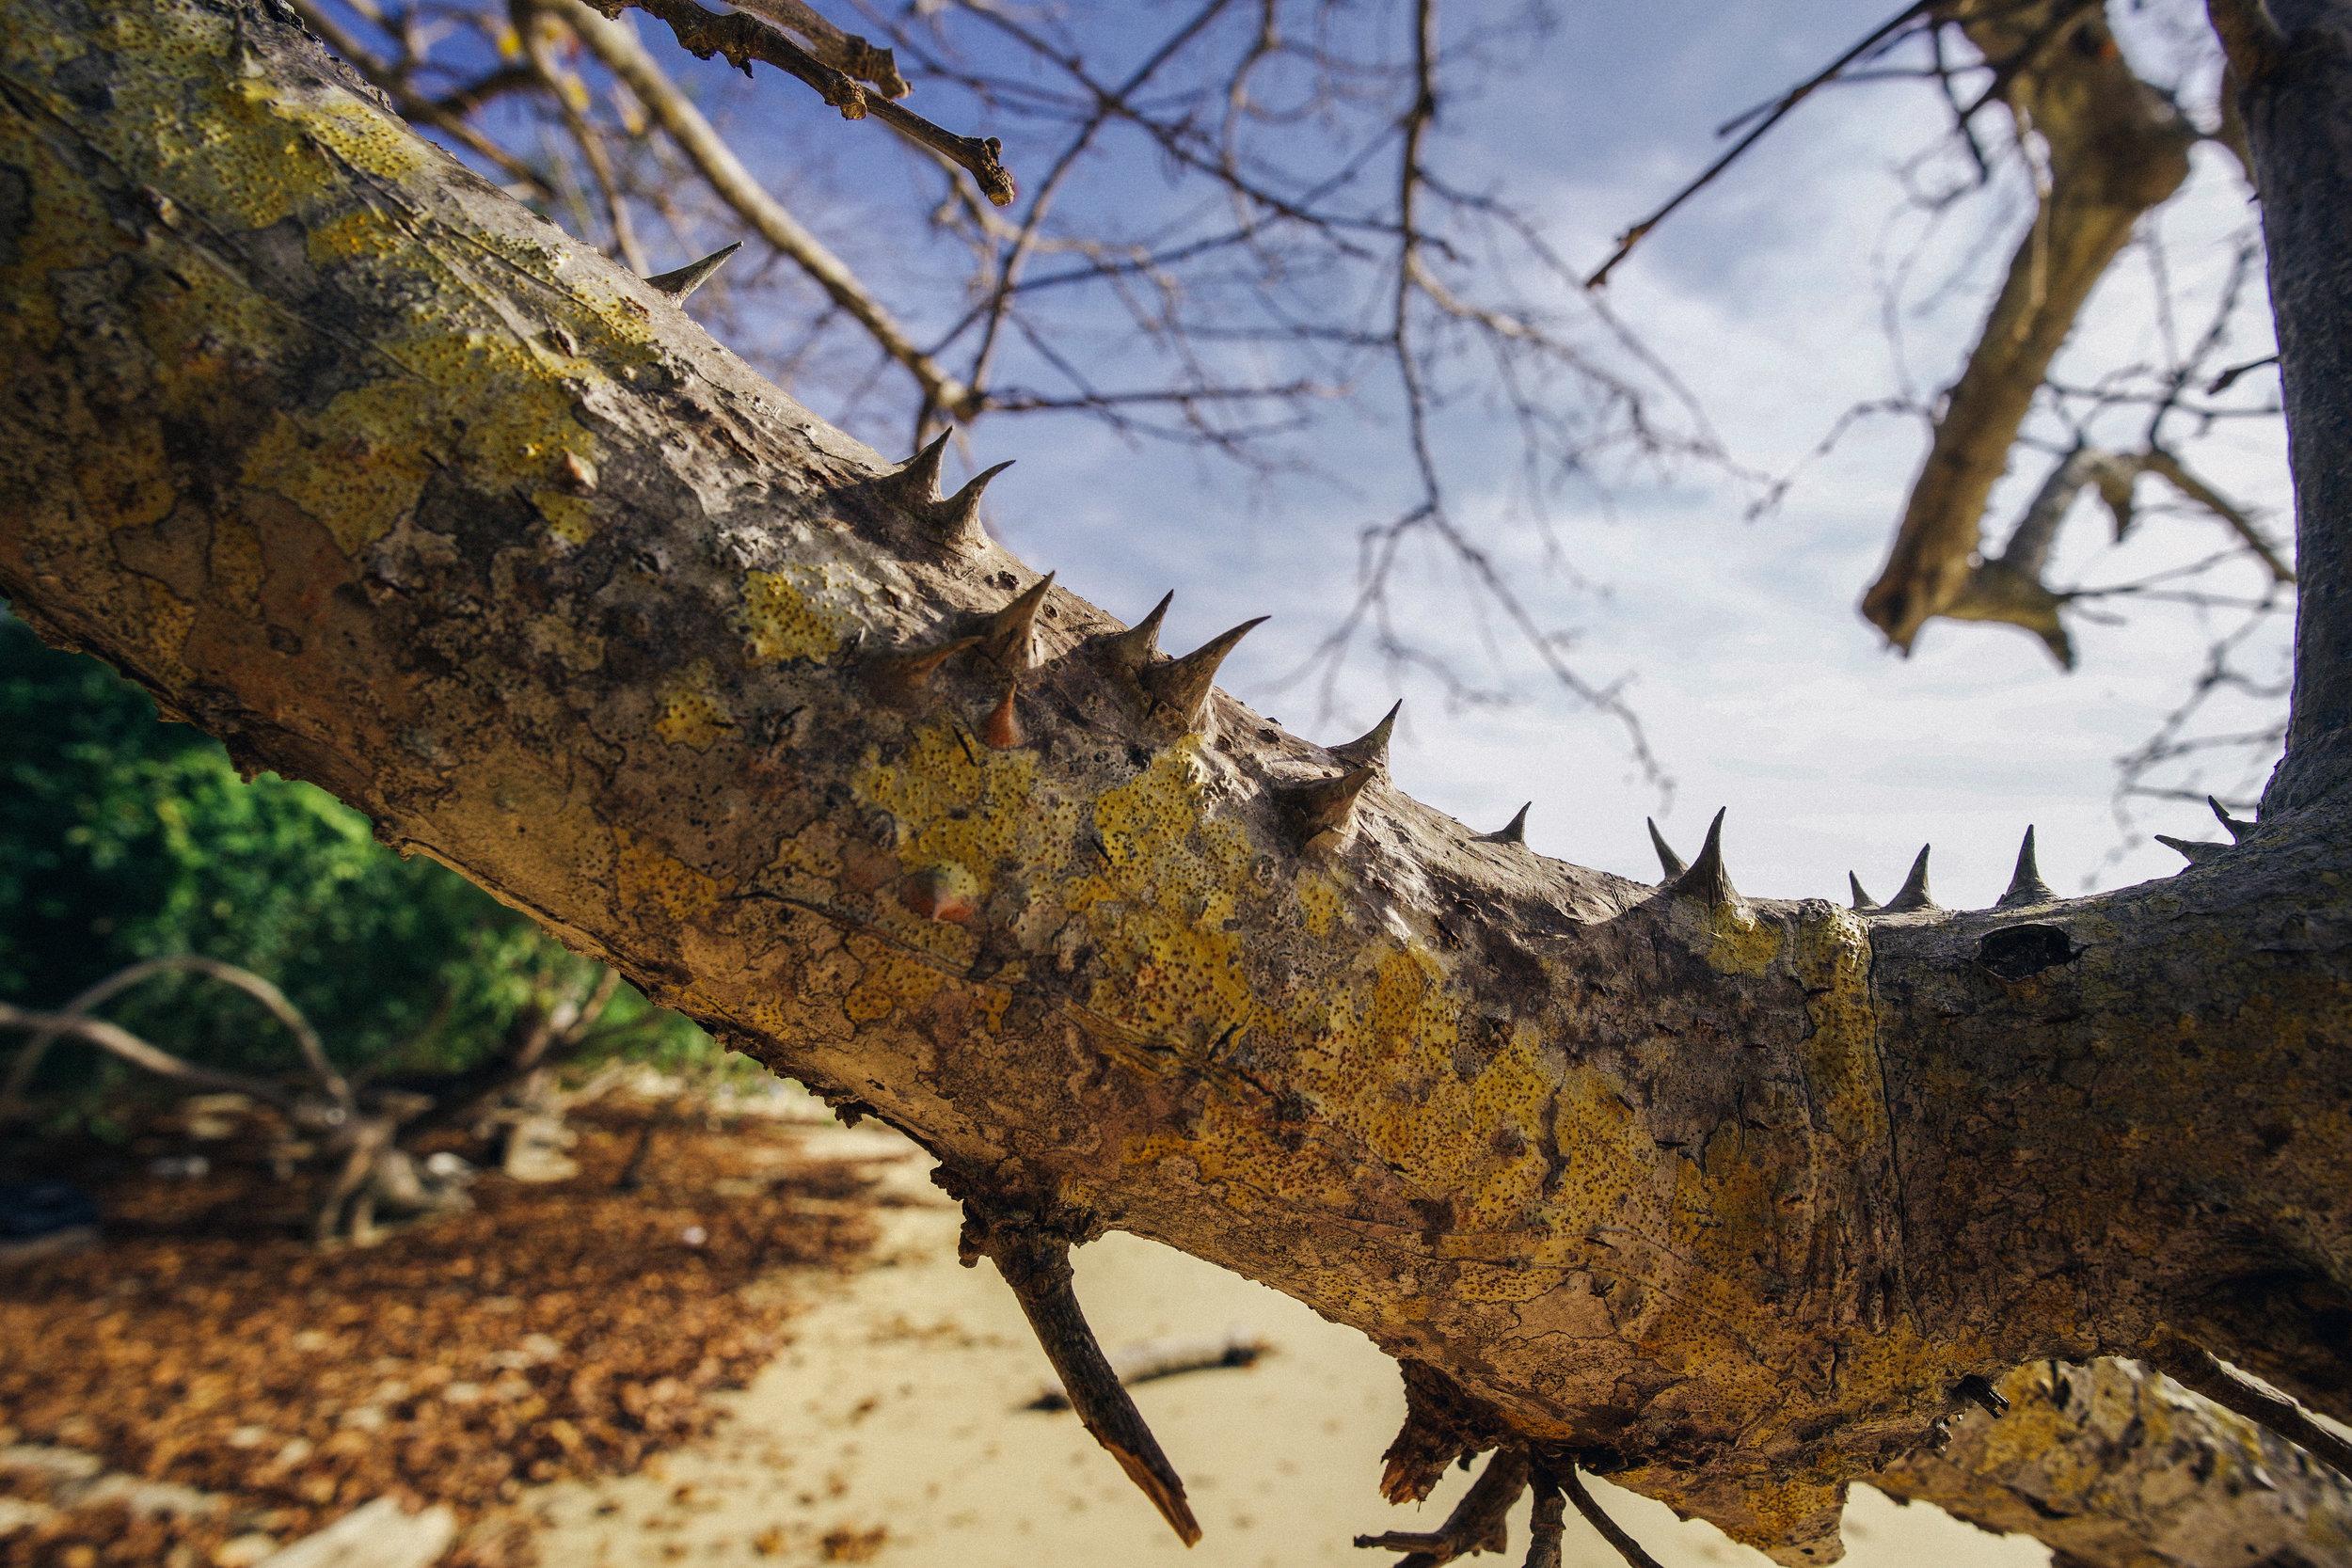 - A mild example of the thorny trees on Isla Chapera